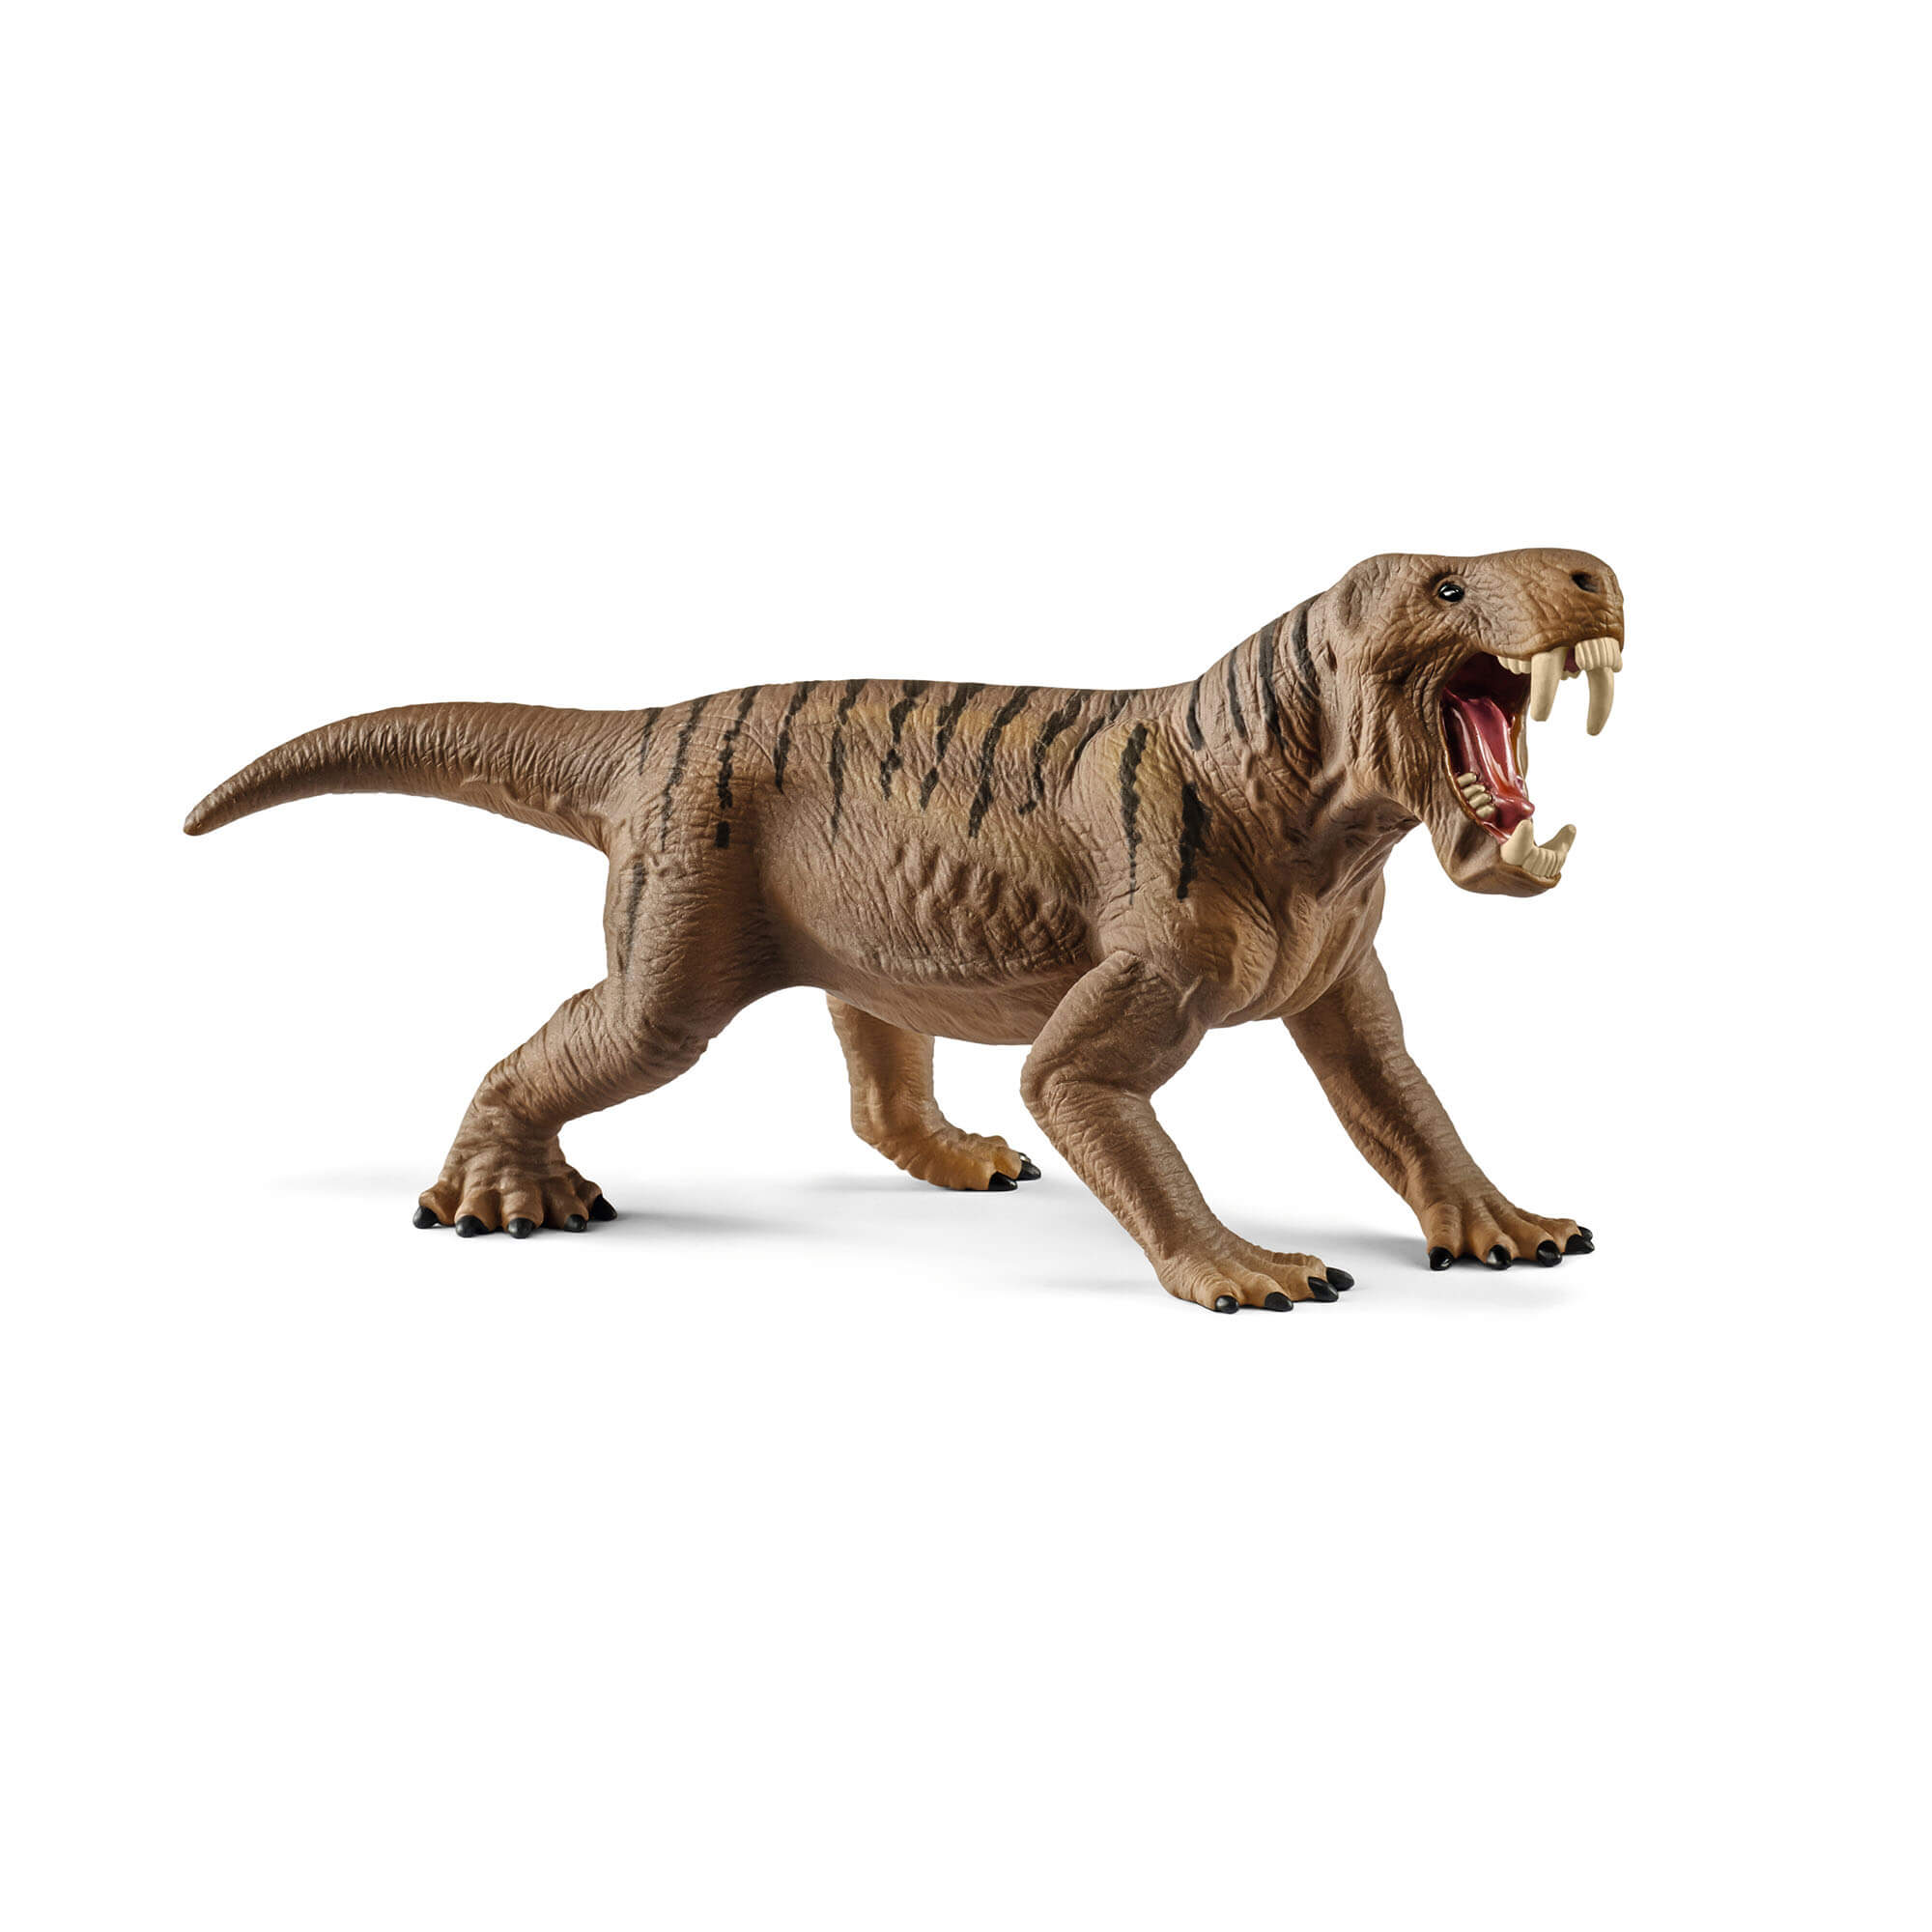 15011 Schleich Dimetrodon Dinosaures Plastique Figure Figurine